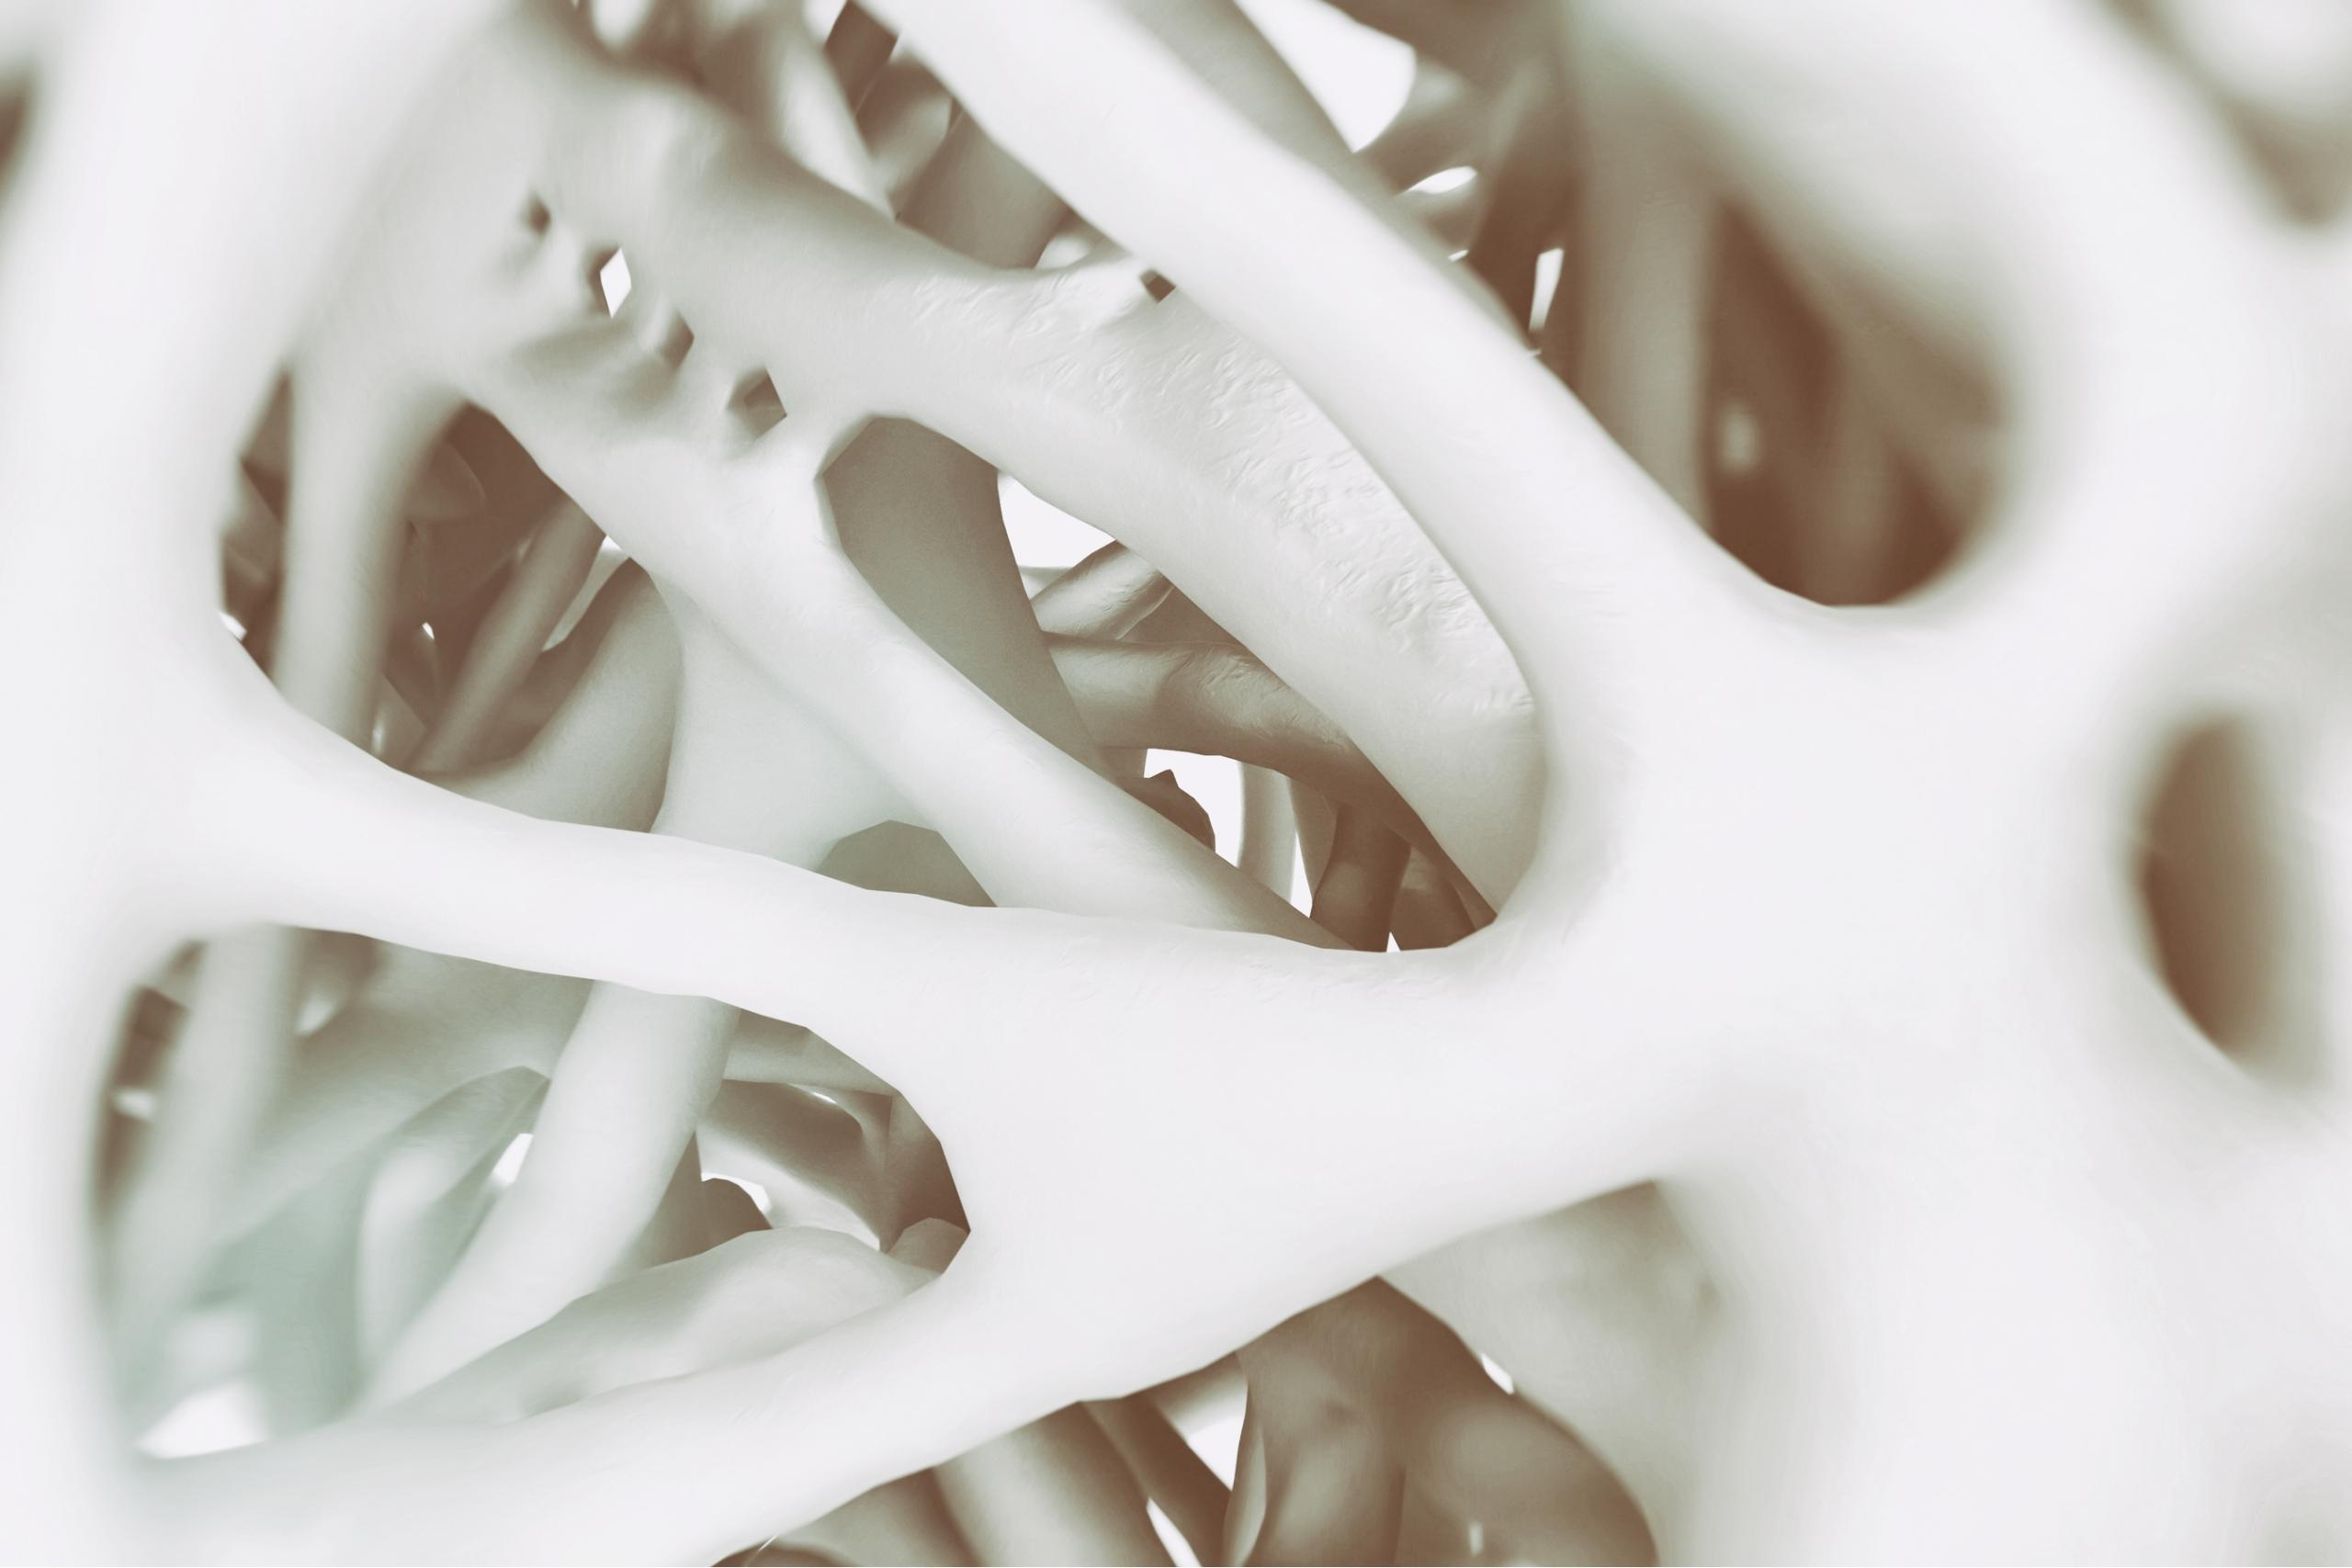 Bone health osteoporosis